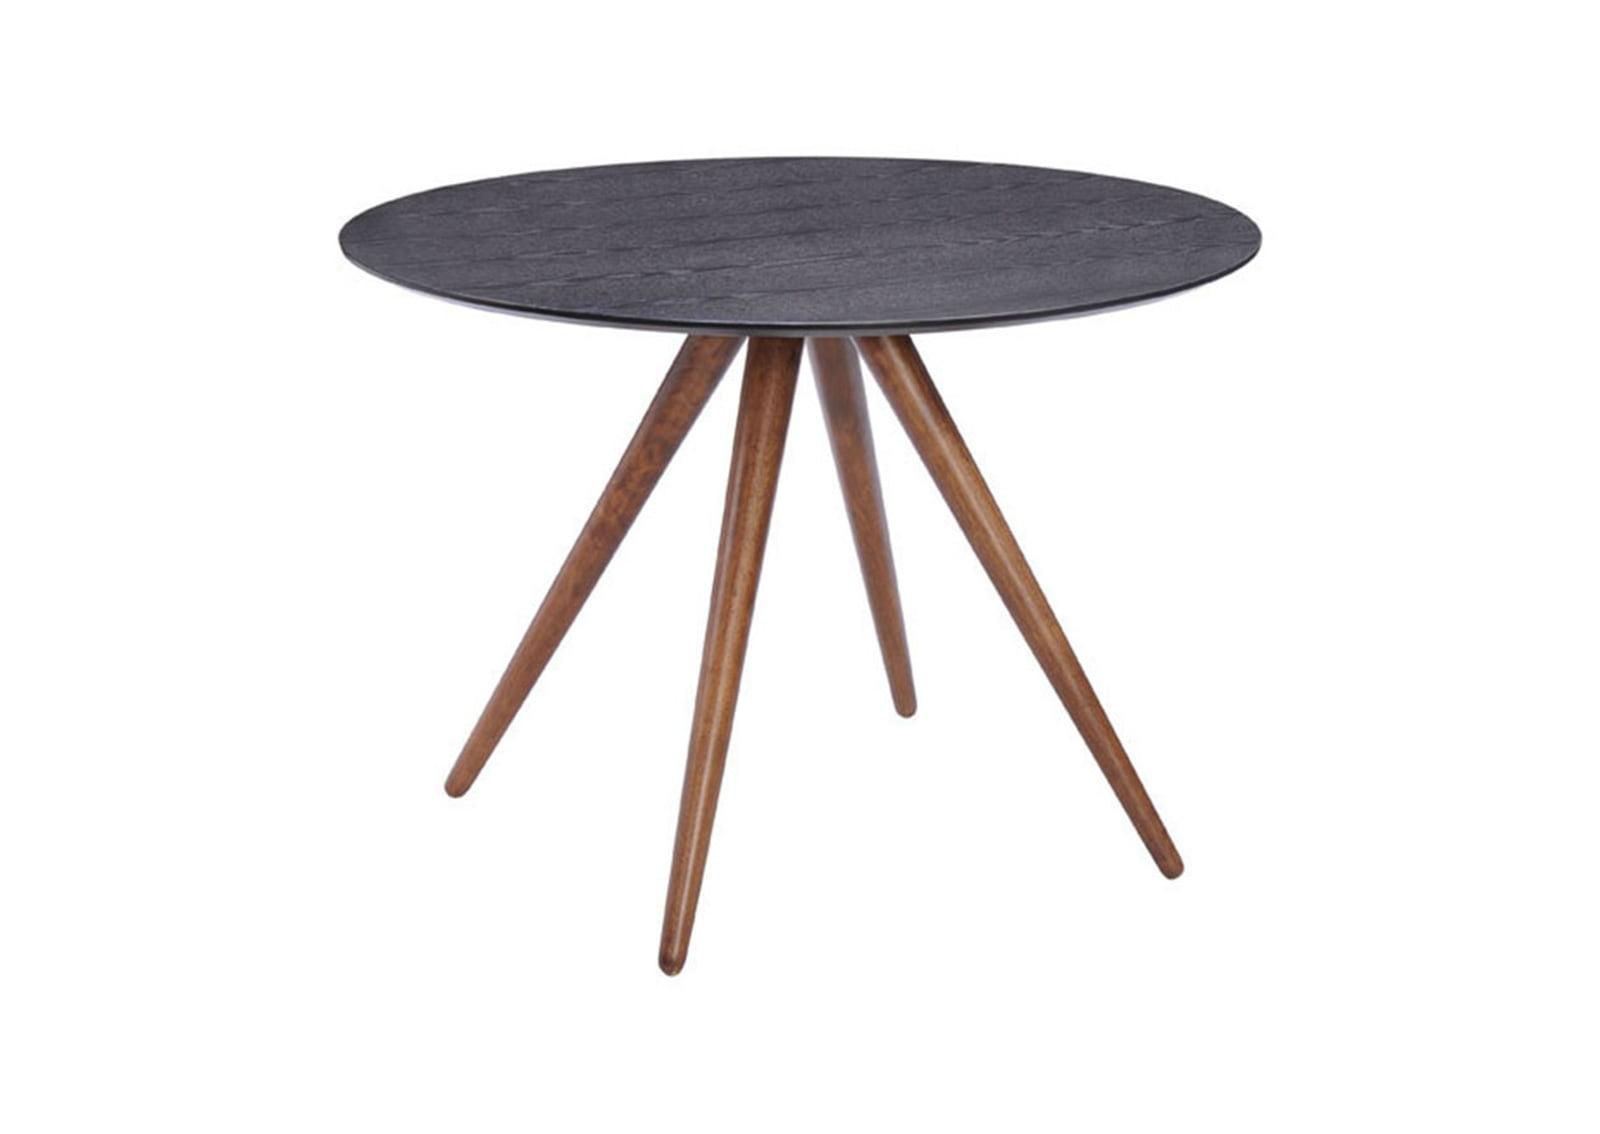 Grapeland-Heights-Dining-Table-Walnut-&-Black1